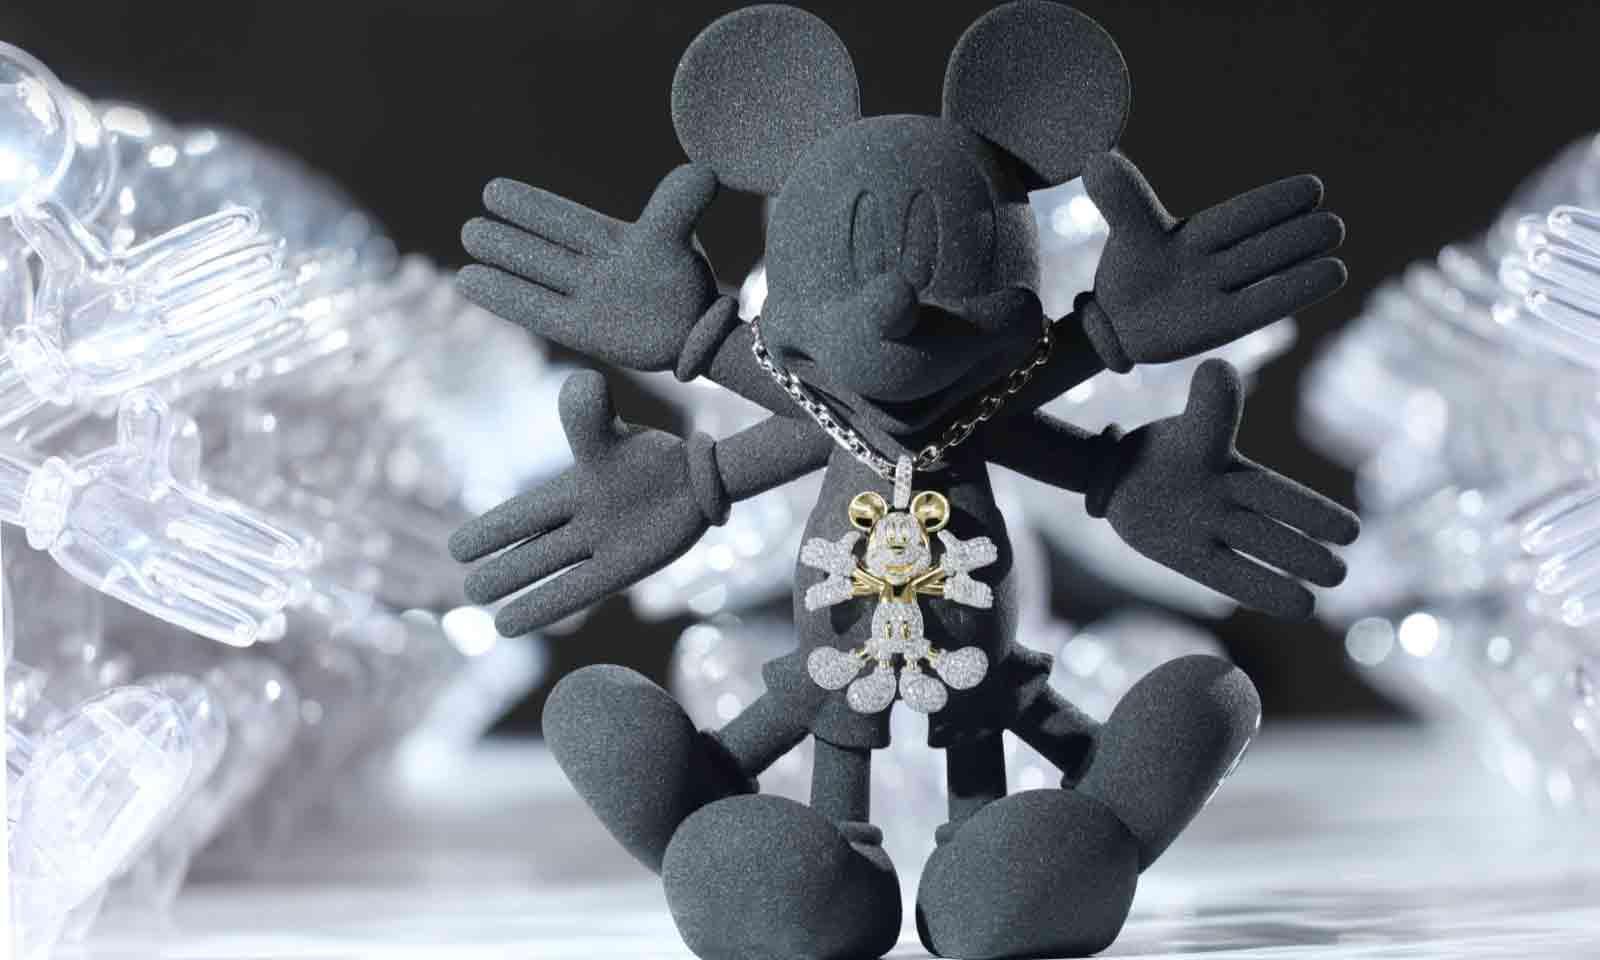 POP INFINITY 联名项目「Snow Angel Mickey」本月最终系列发售敲定